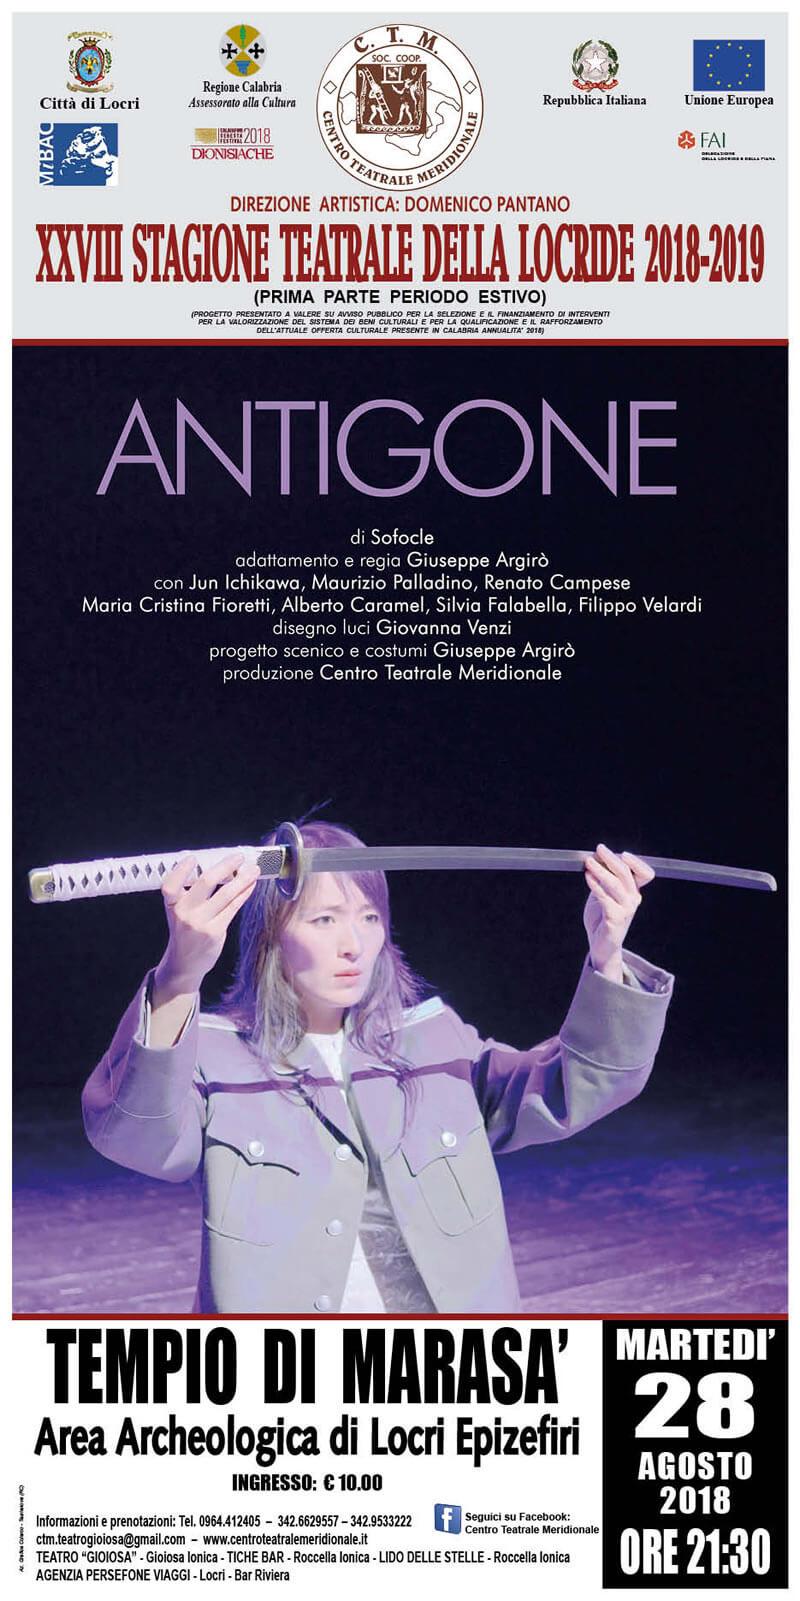 Antigone di Sofocle a Locri Epizefiri 28 agosto 2018 locandina